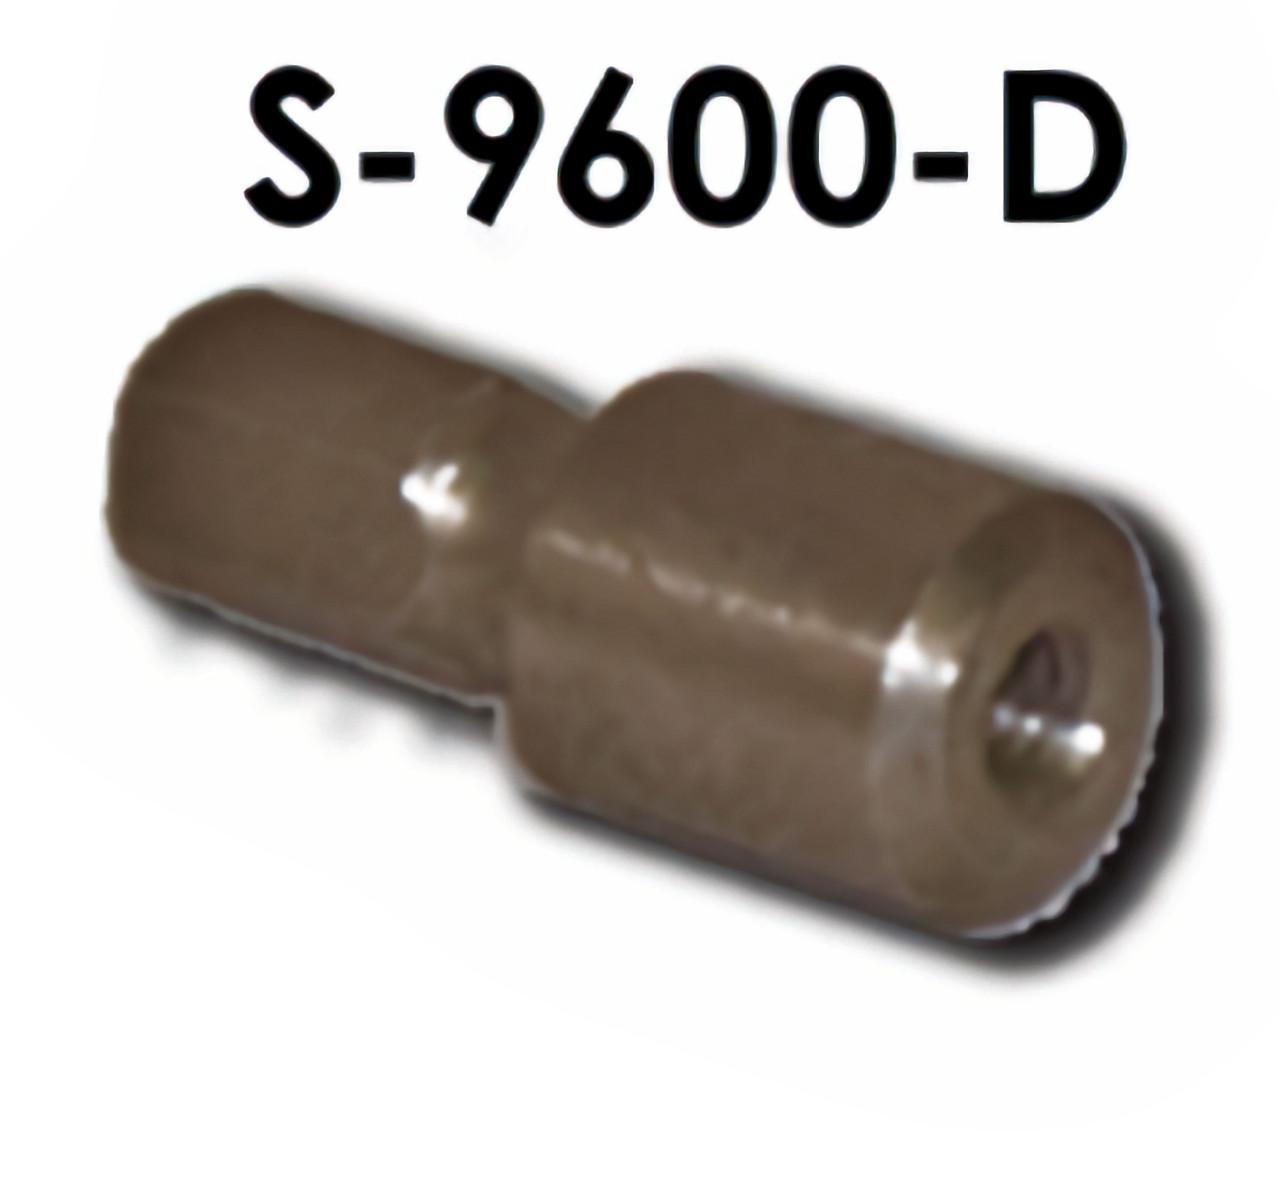 S-9600 Rail Bolt Driver